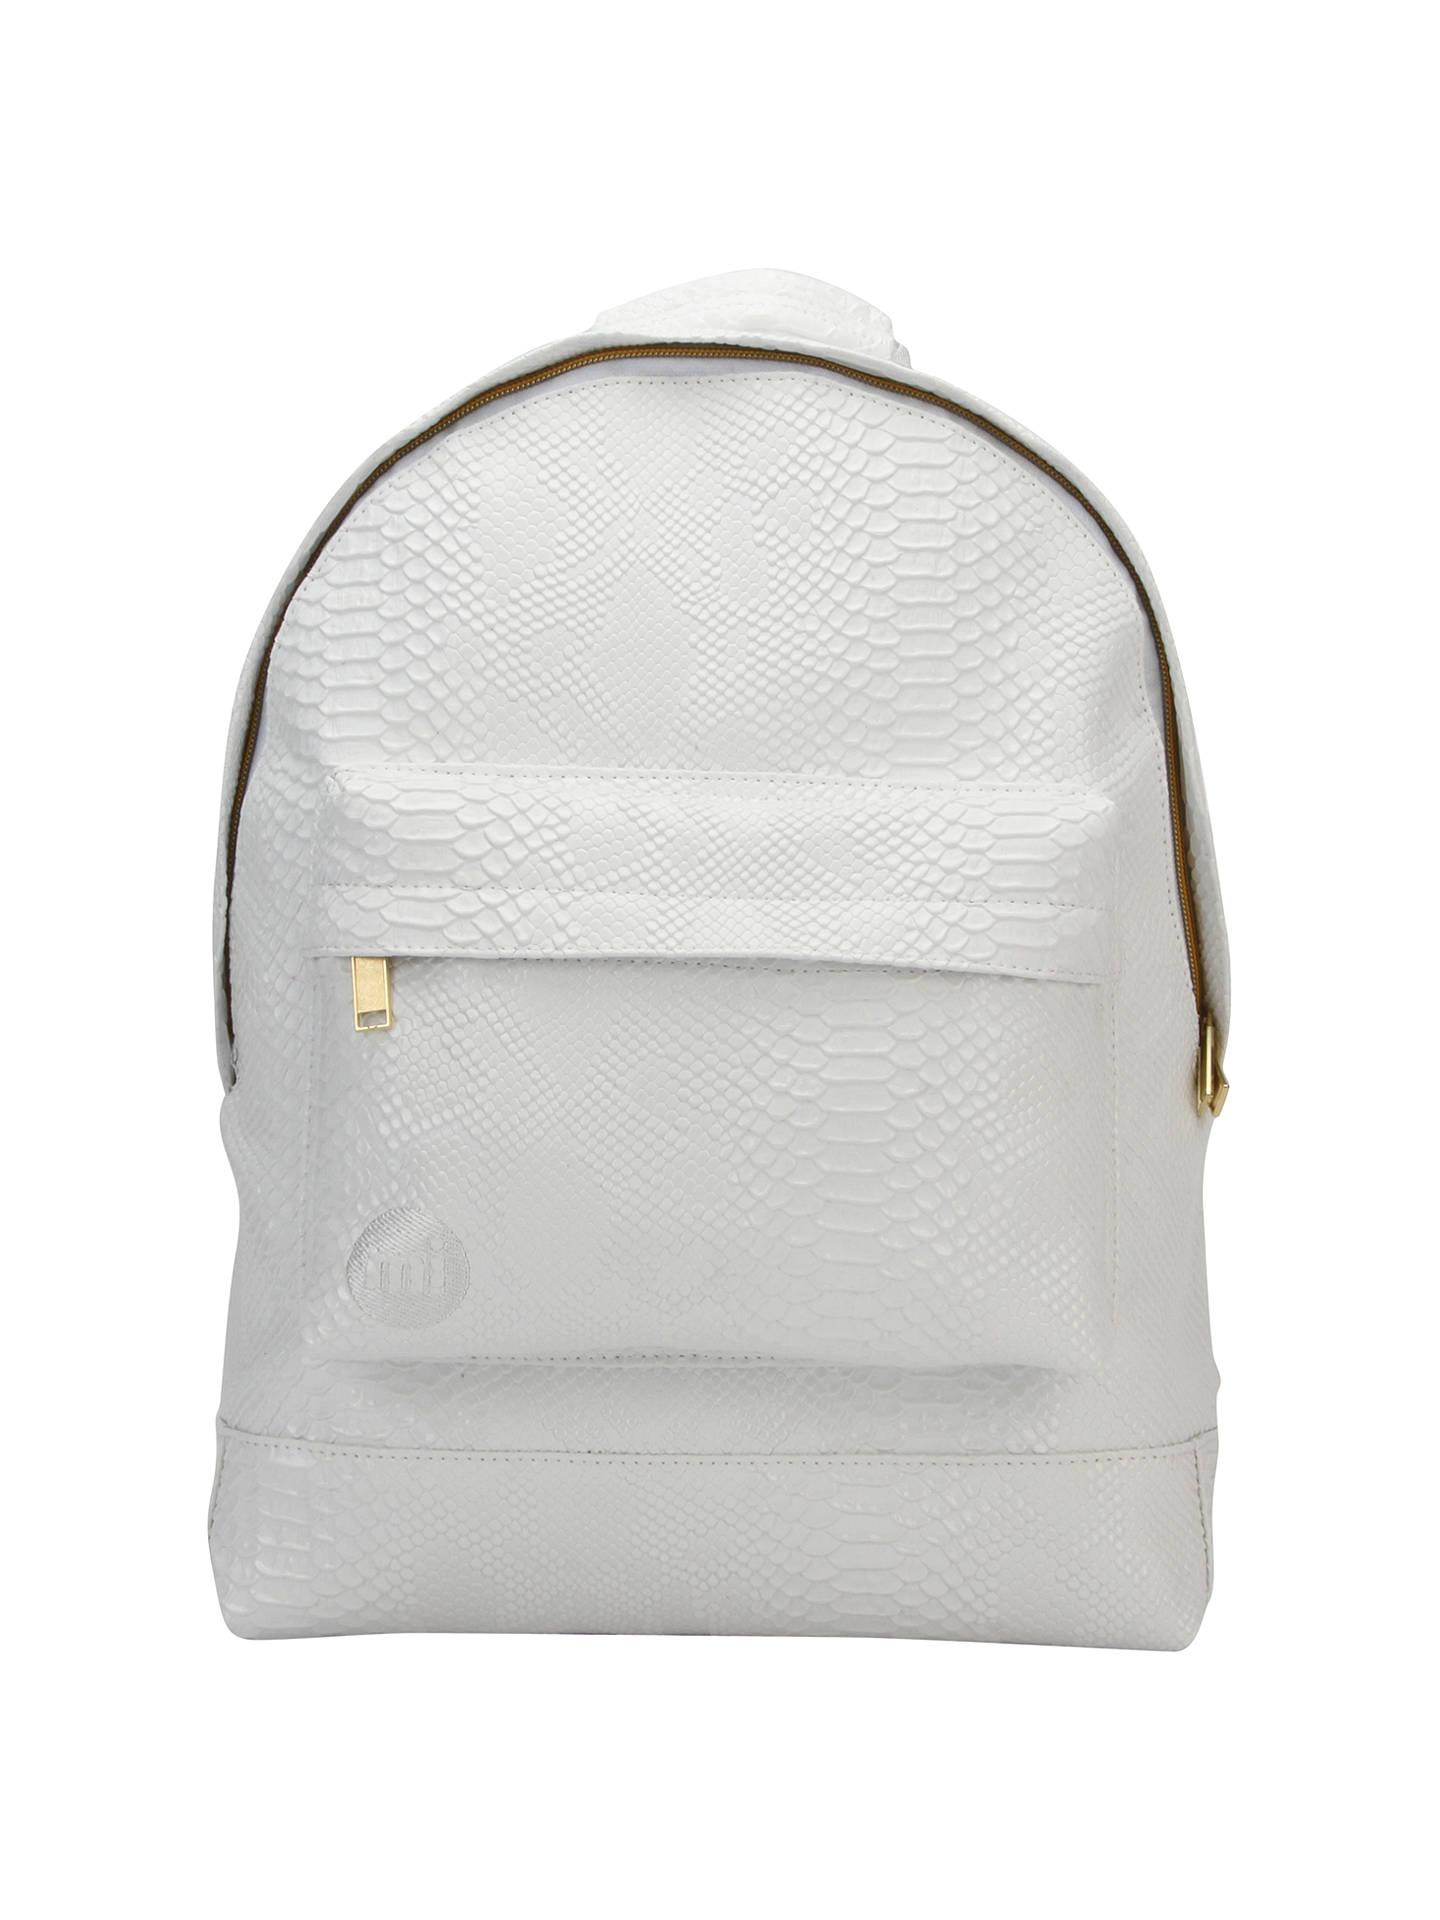 b148dabb787 Buy Mi-Pac Faux Python Backpack, White Online at johnlewis.com ...